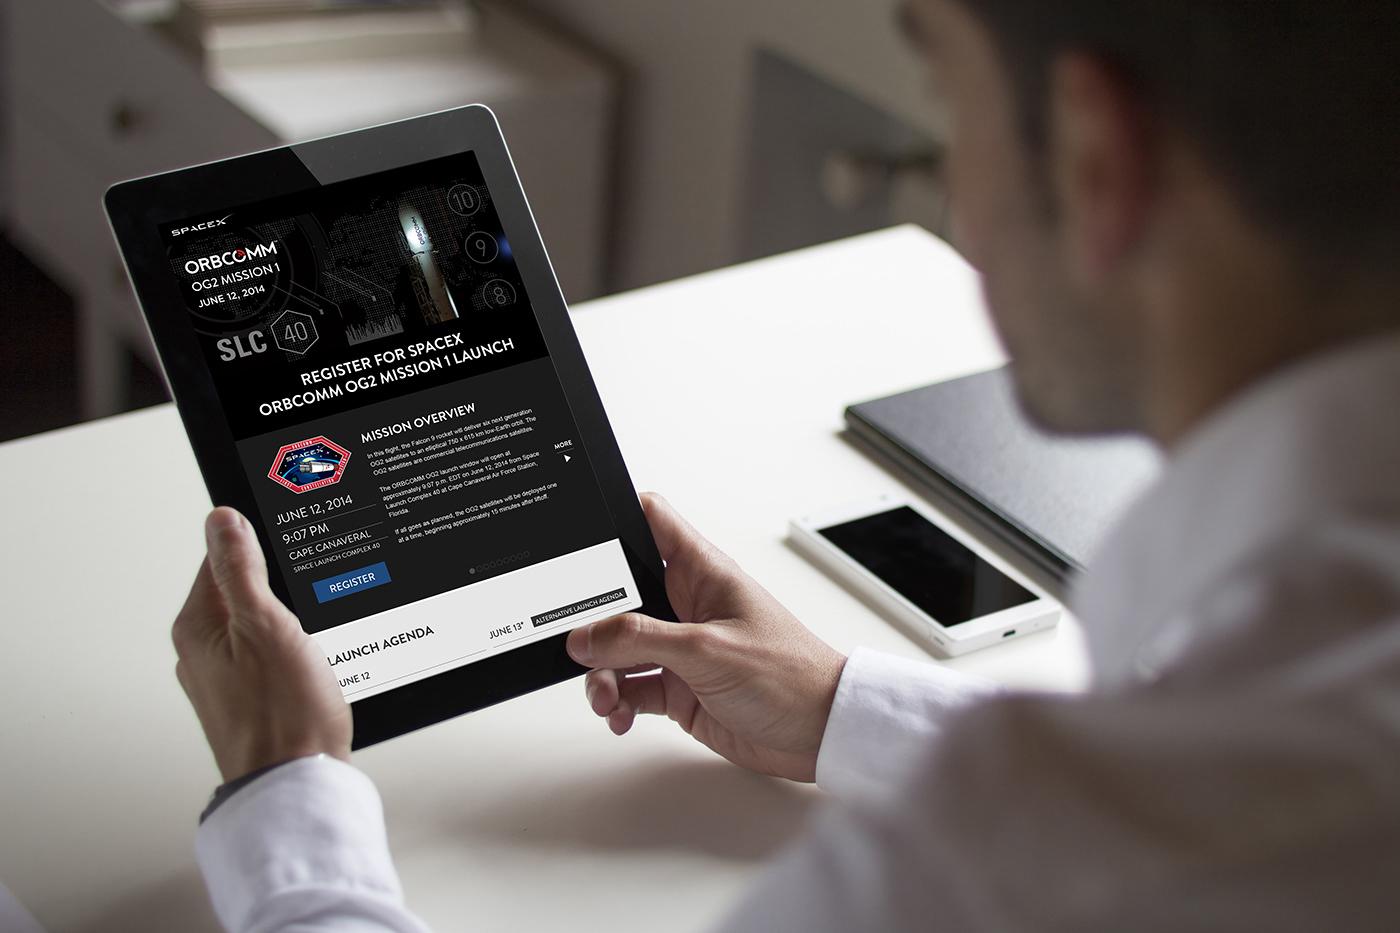 SPACEX Launch Registration Website